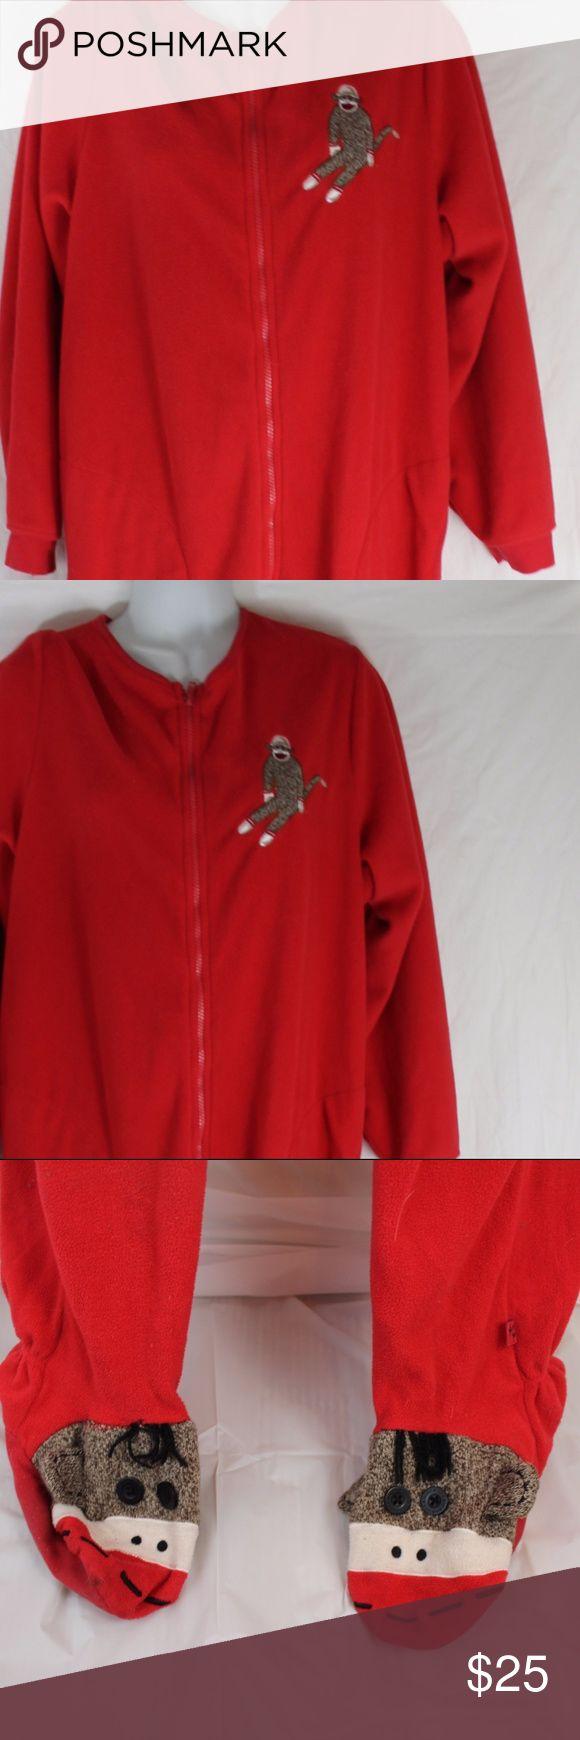 Nick and Nora Sock Monkey sz Large Footed Pajamas Nick and Nora Sock Monkey sz Large Footed Pajamas red fleece Nick & Nora Intimates & Sleepwear Pajamas